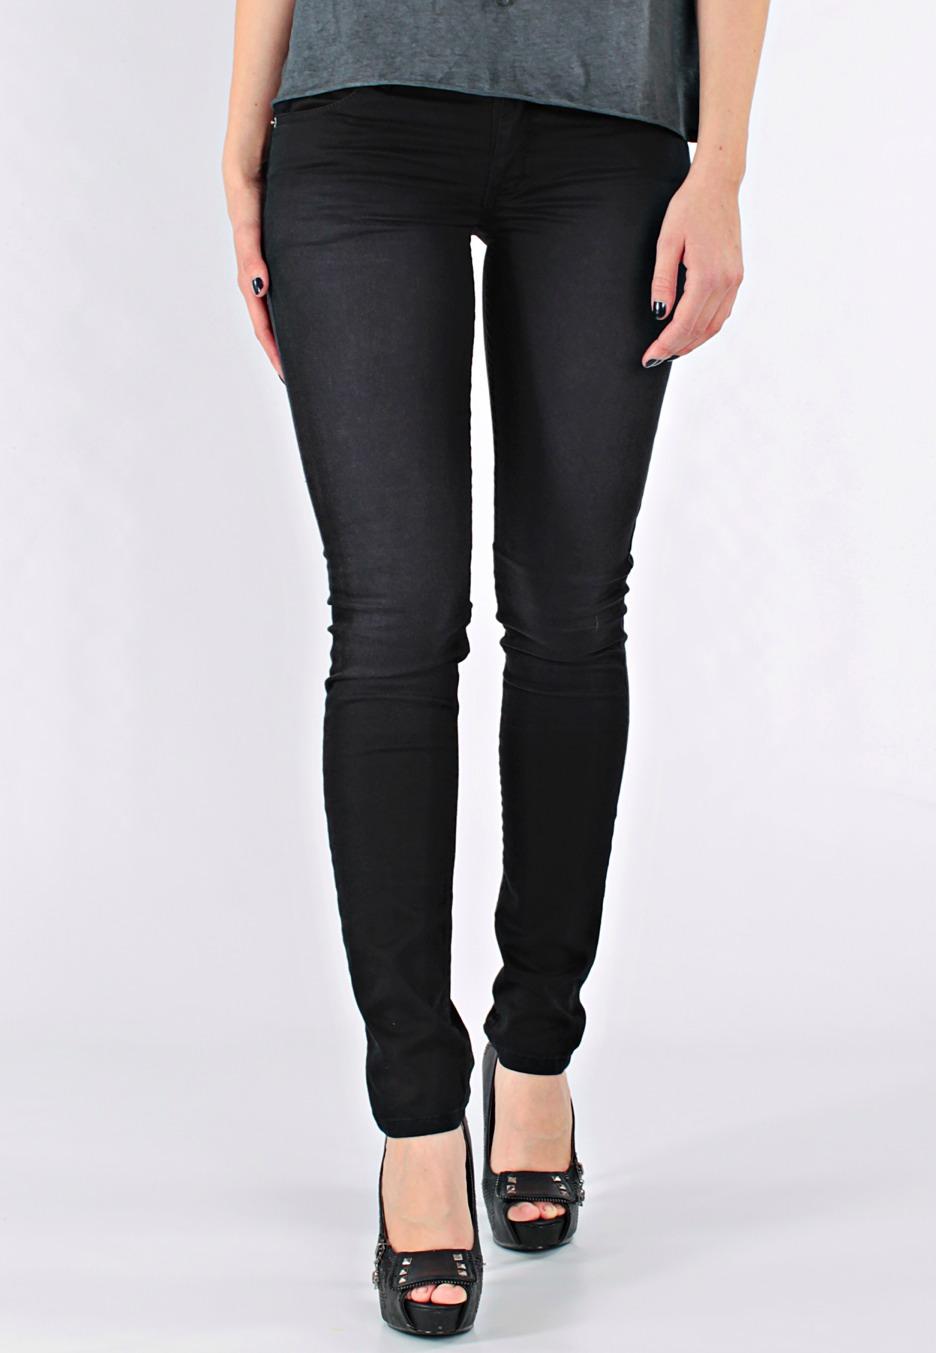 Cheap Monday - Narrow Satin Used Black - Girl Jeans - Impericon ...